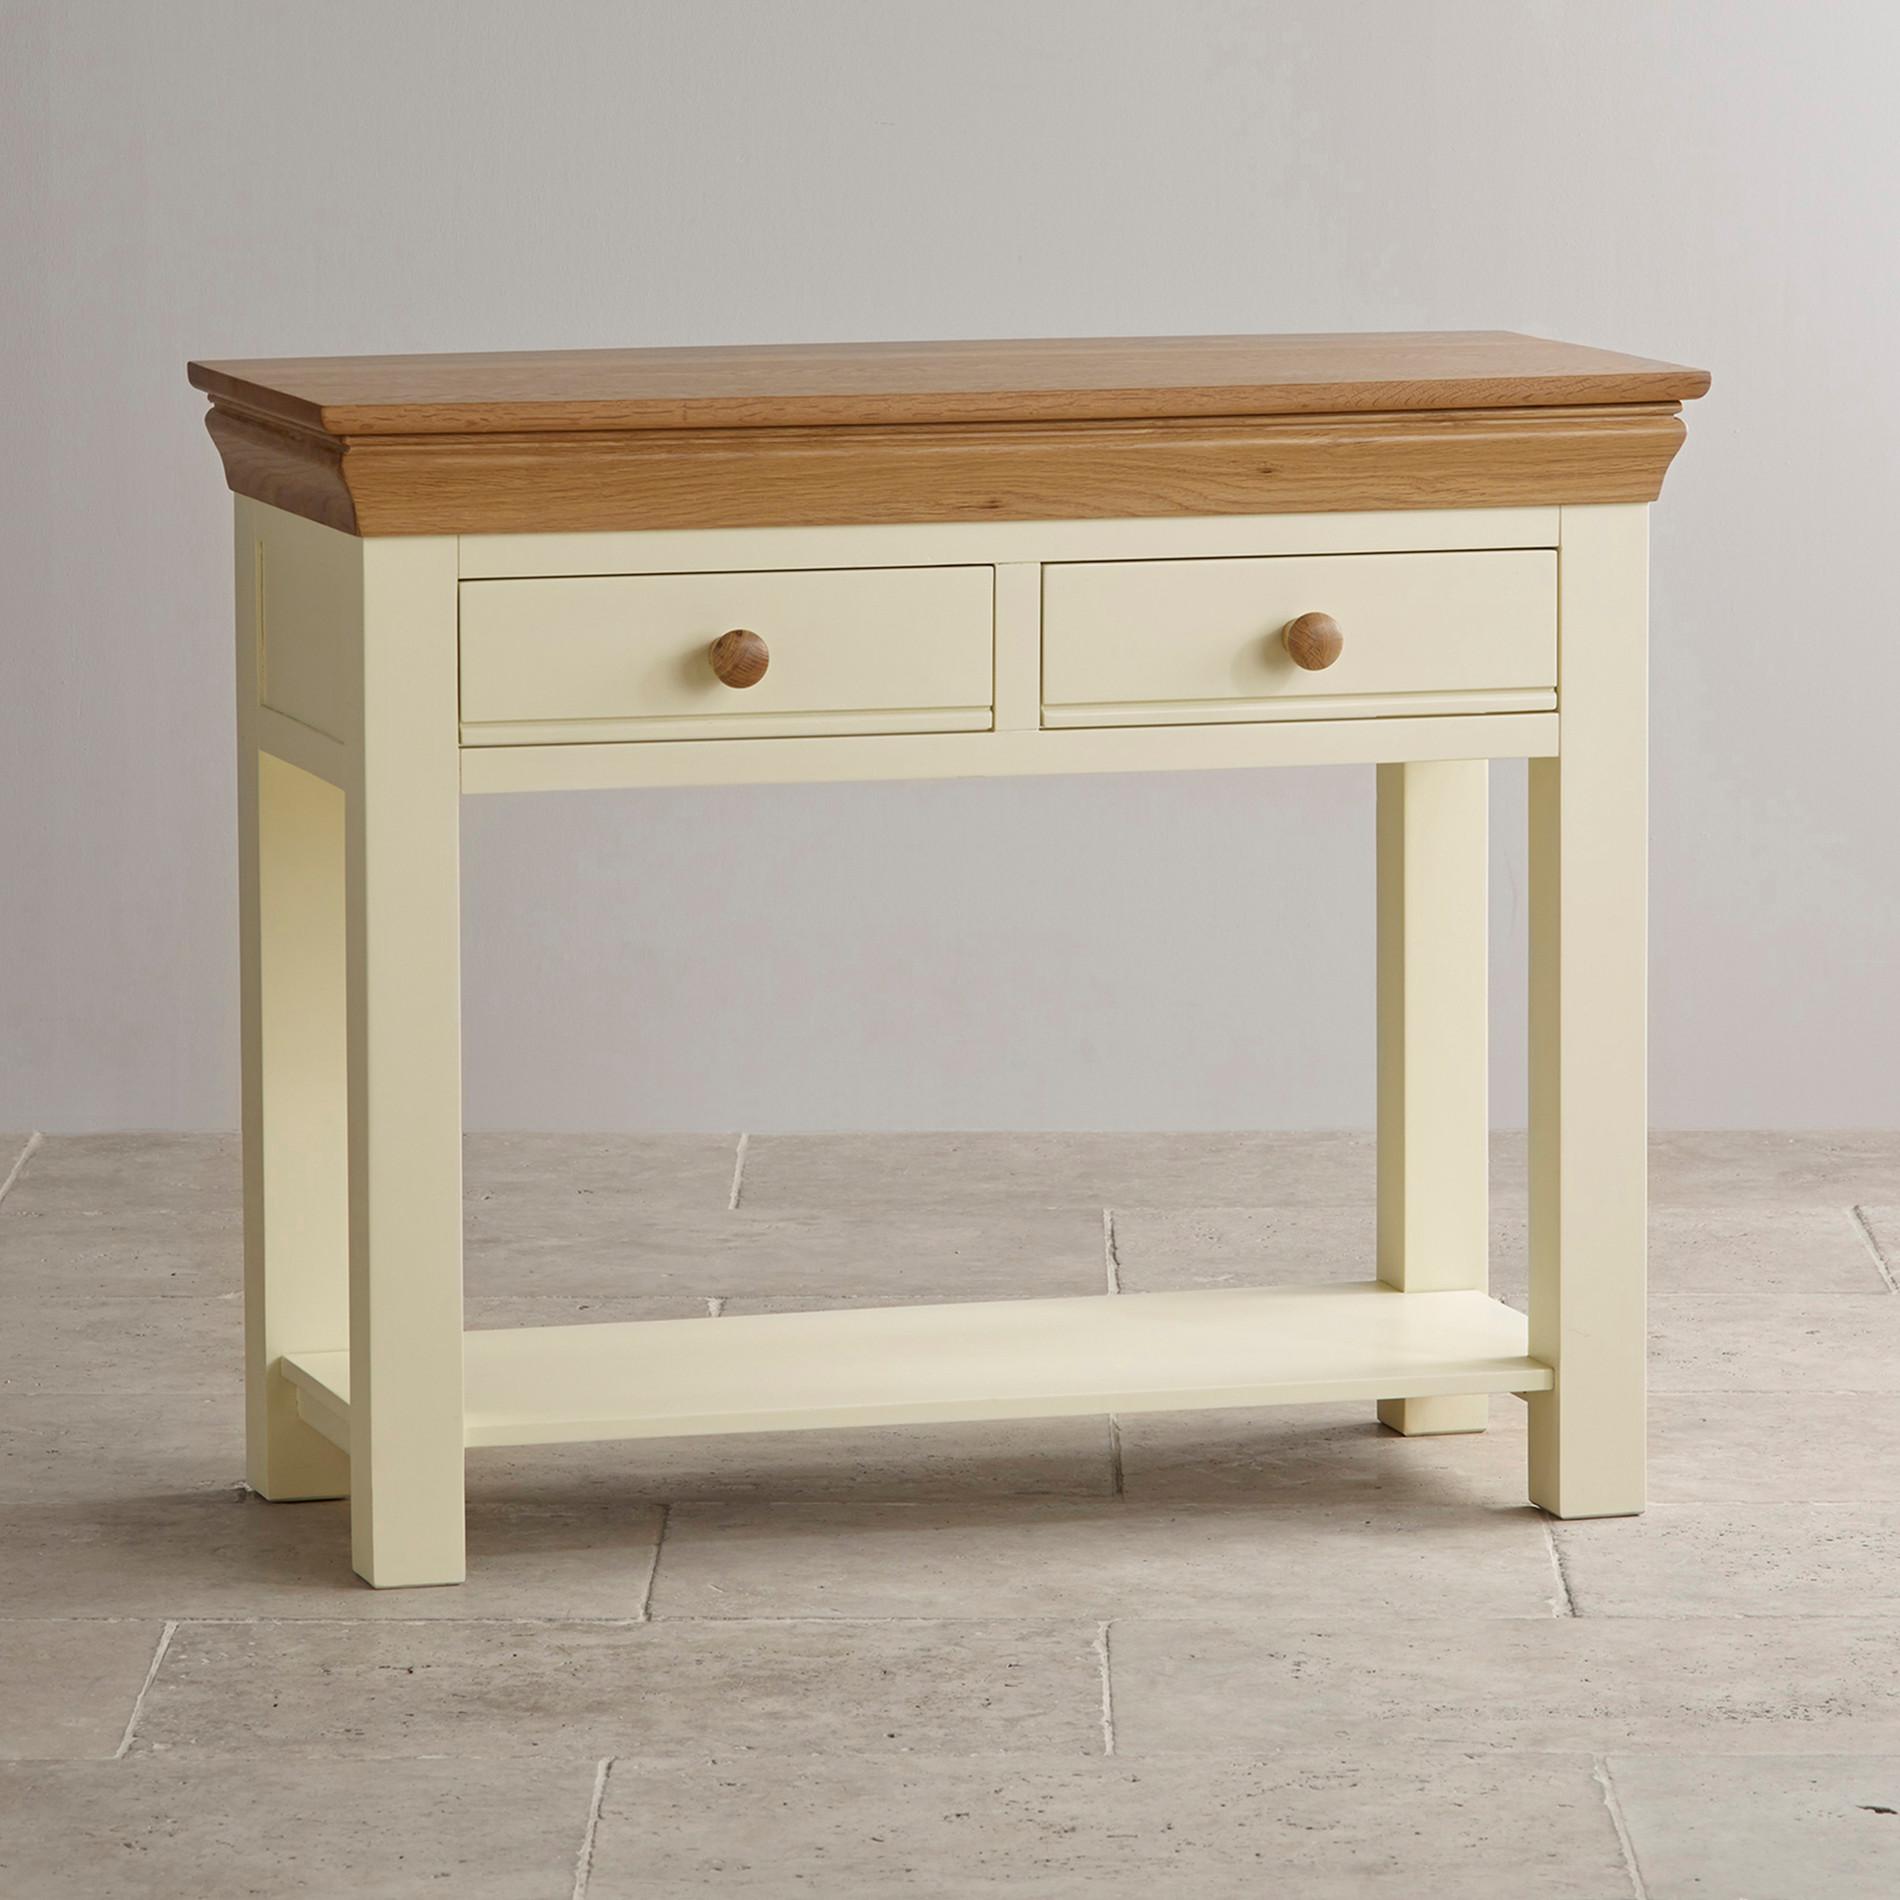 painted console table. Painted Console Table D